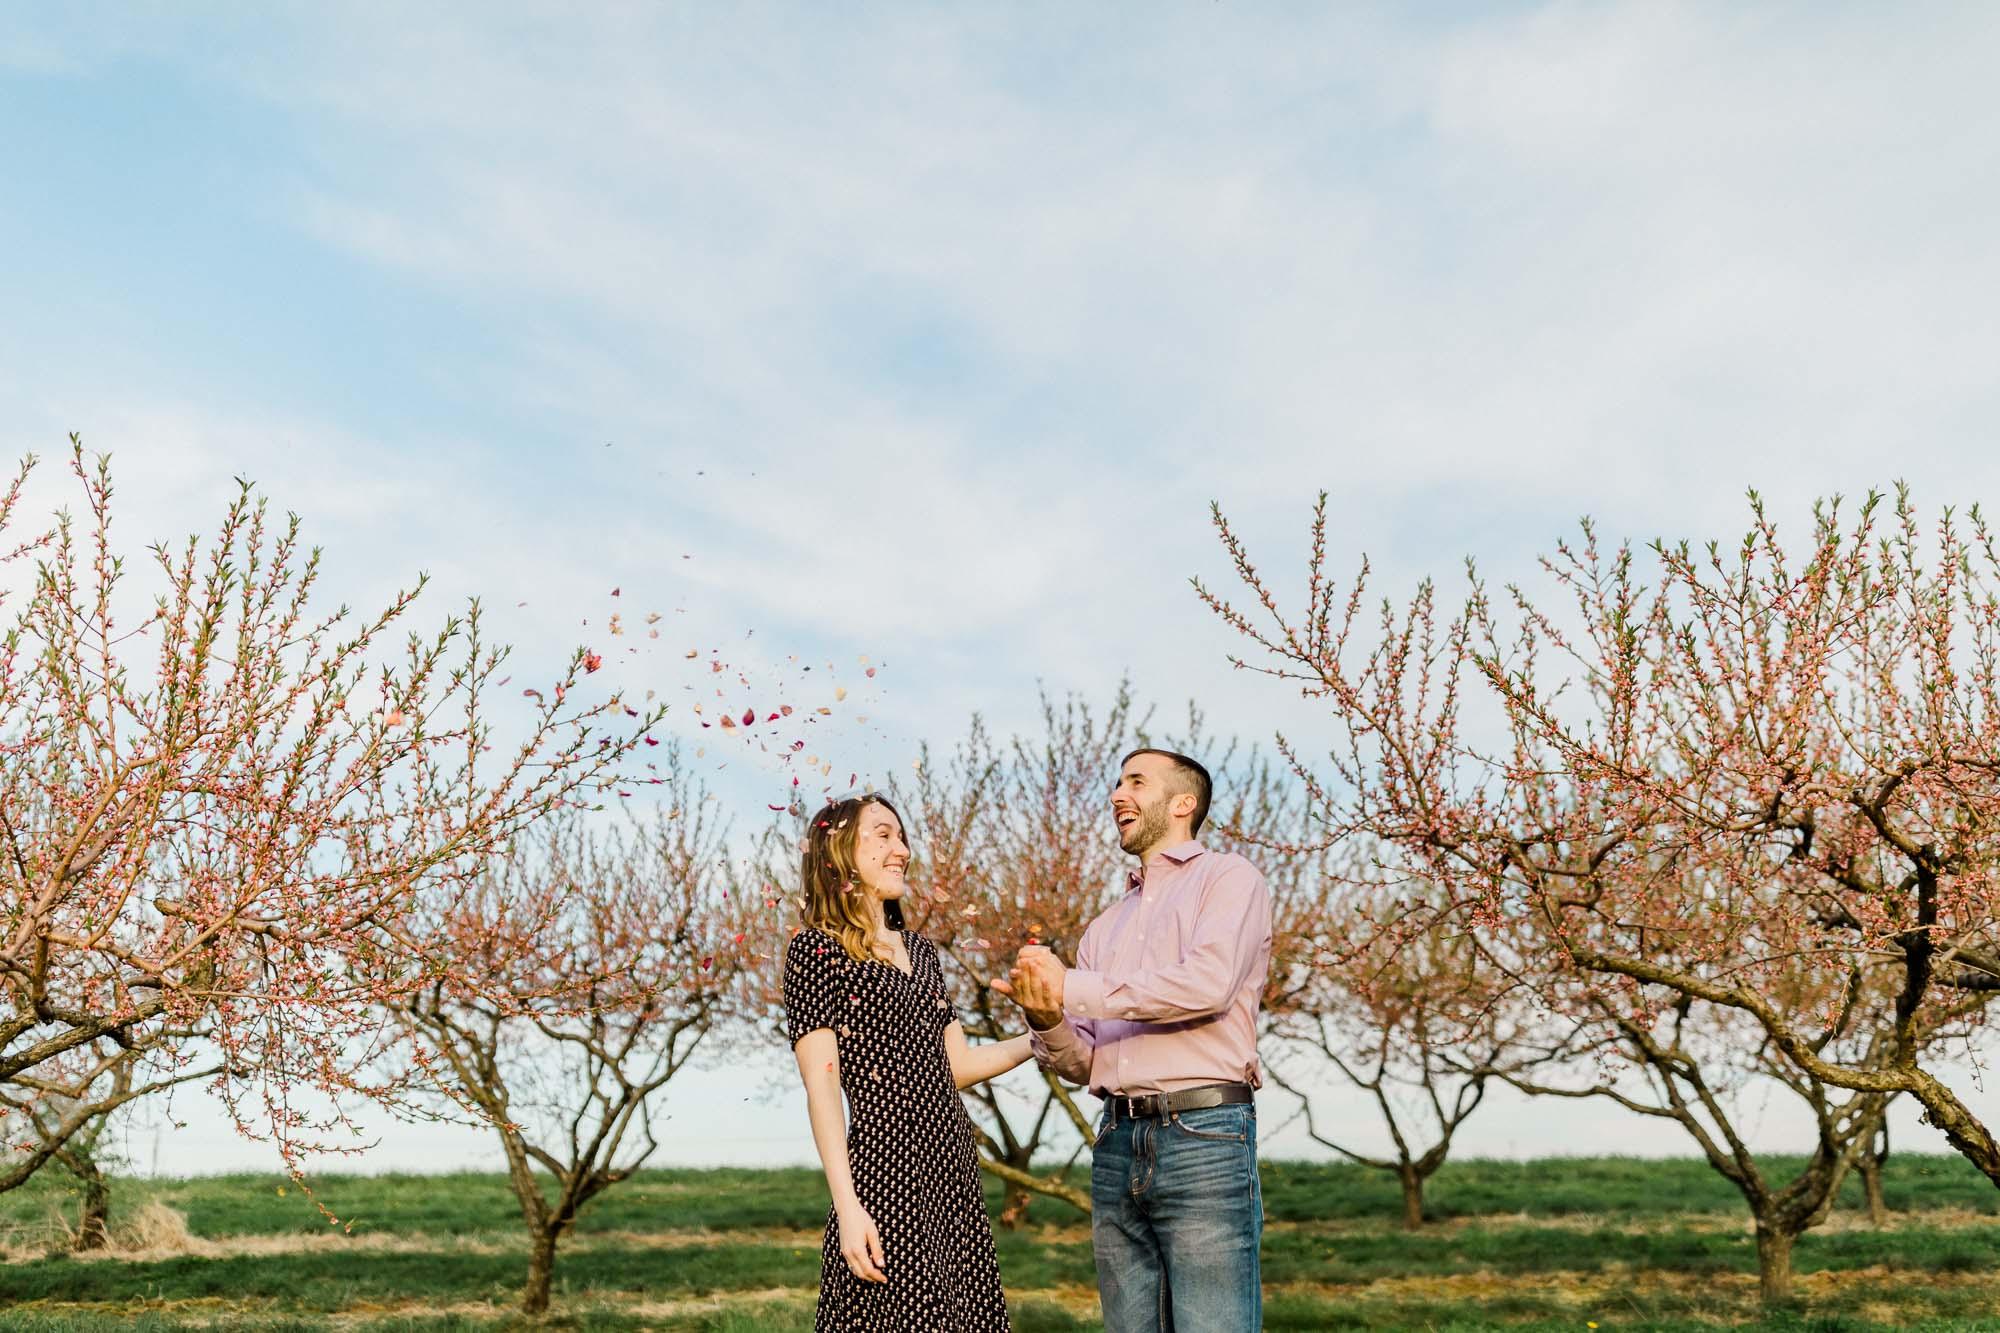 Rohrbachs-Spring-cherry-blossom-engagement-7624.jpg